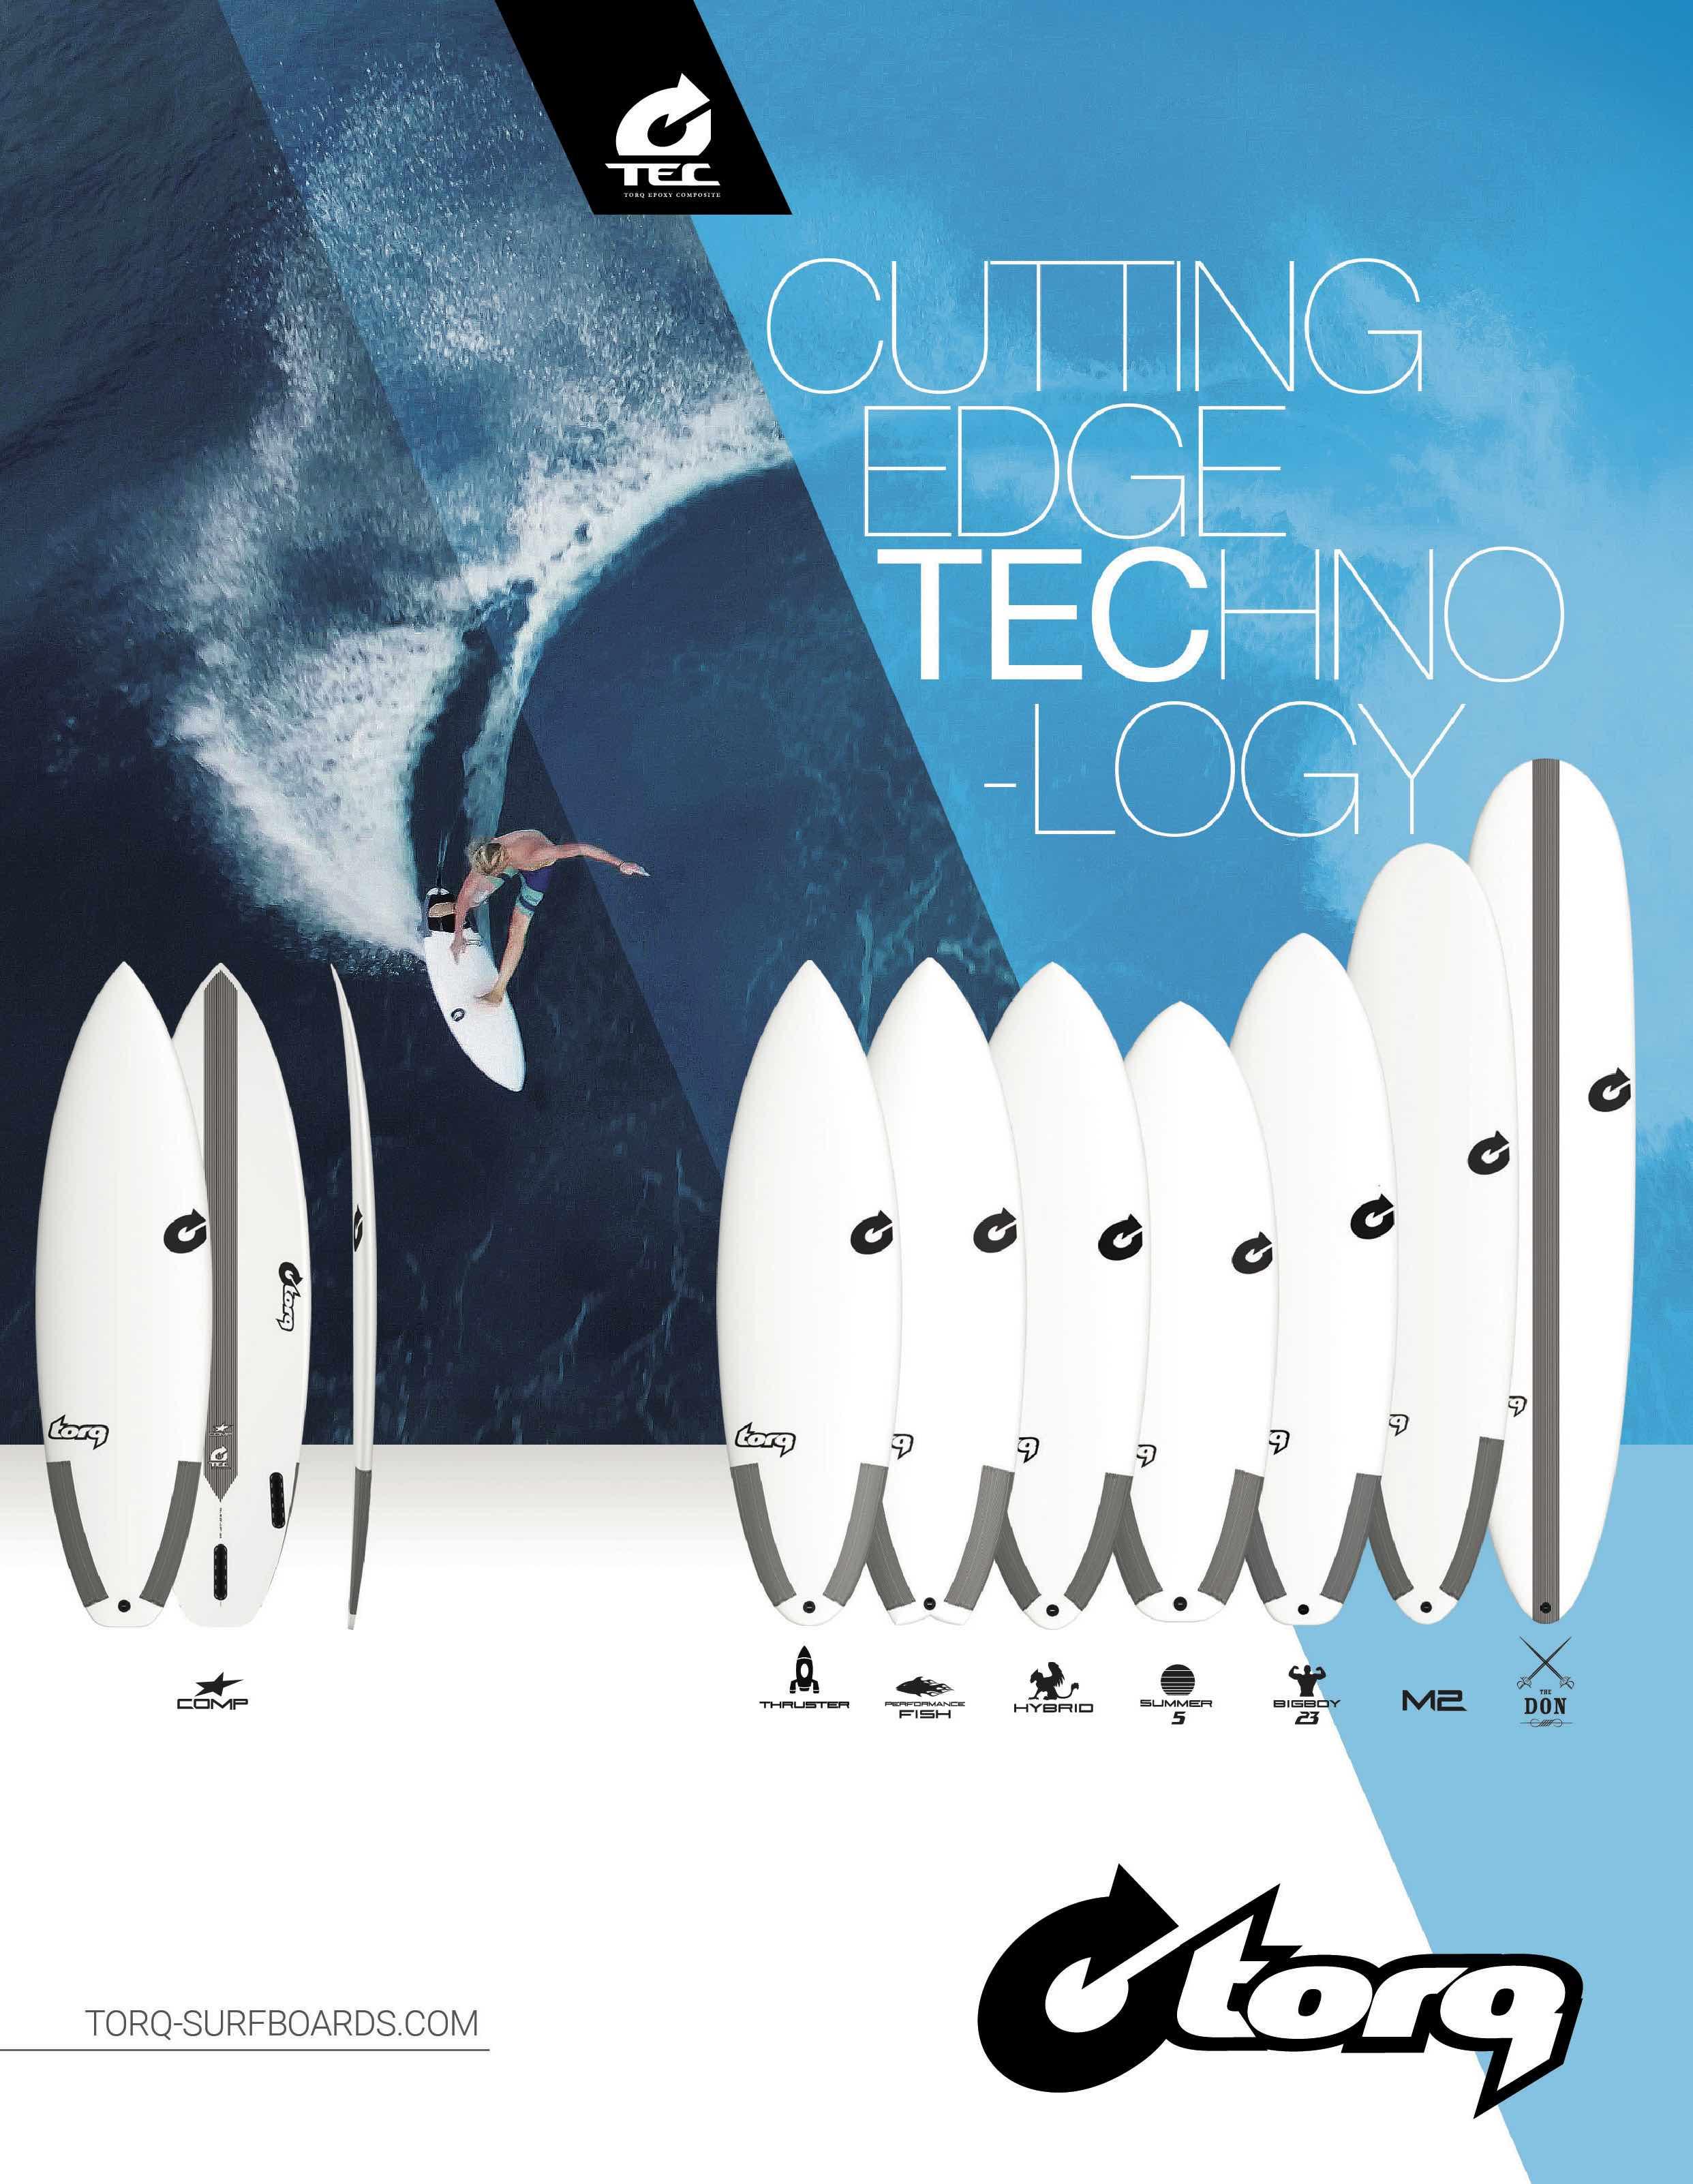 86 Torq SURF